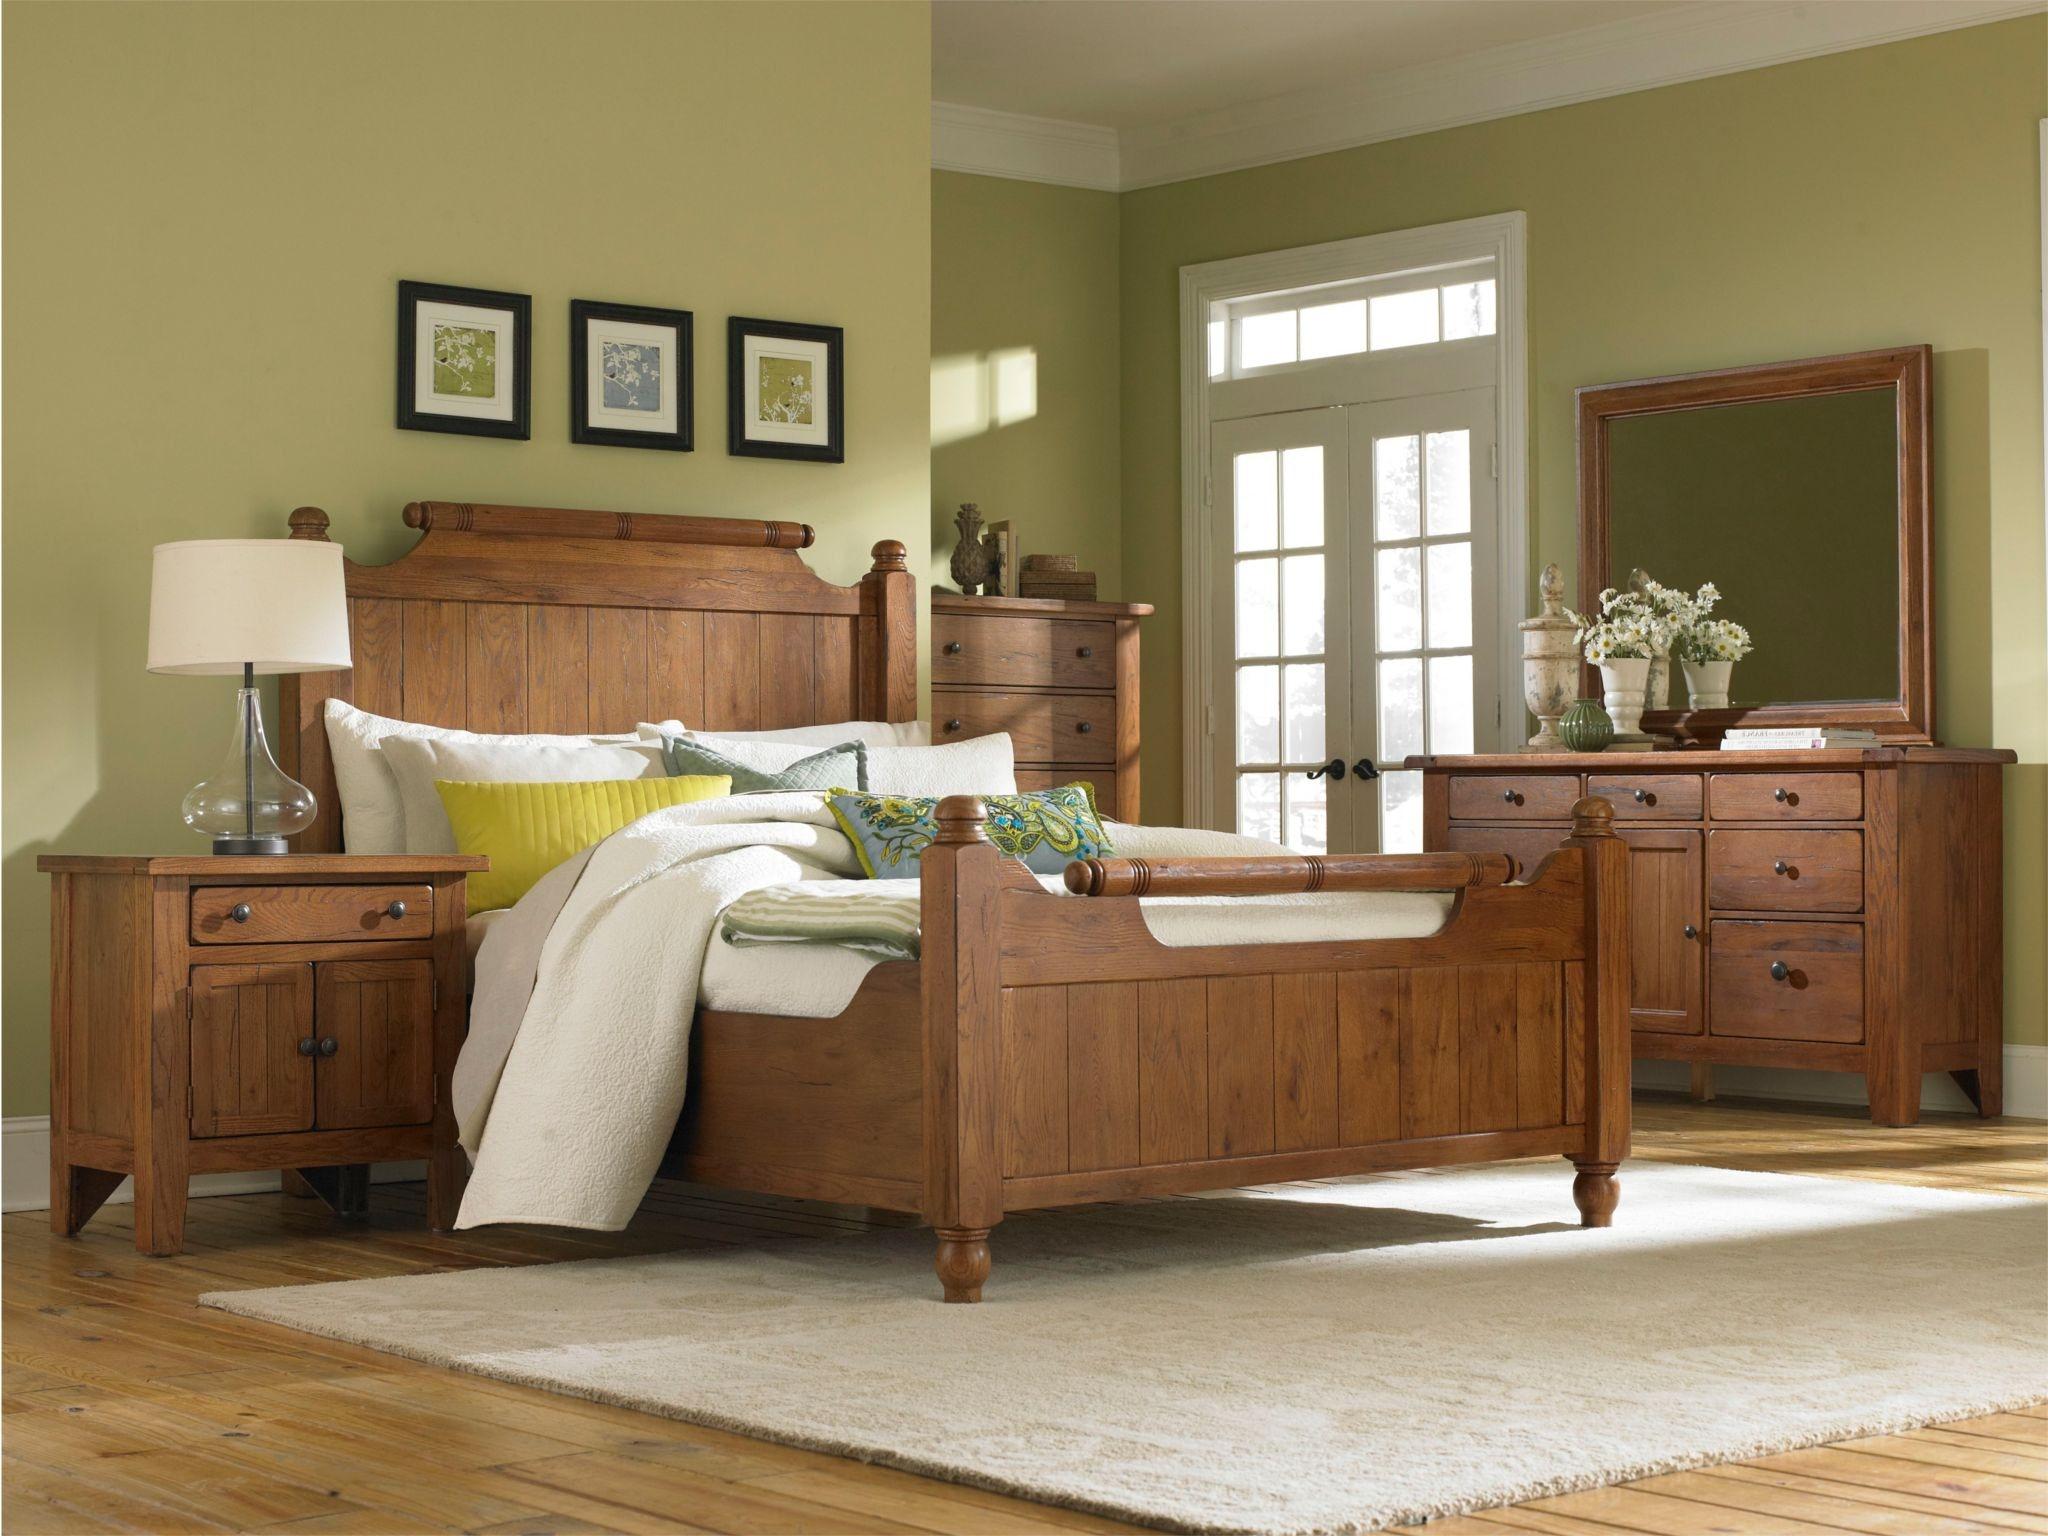 Broyhill Bedroom Attic Heirlooms Wood Hook On Rails, Rustic Oak Stain,  Queen/King 4399 570   Lenoir Empire Furniture   Johnson City, TN